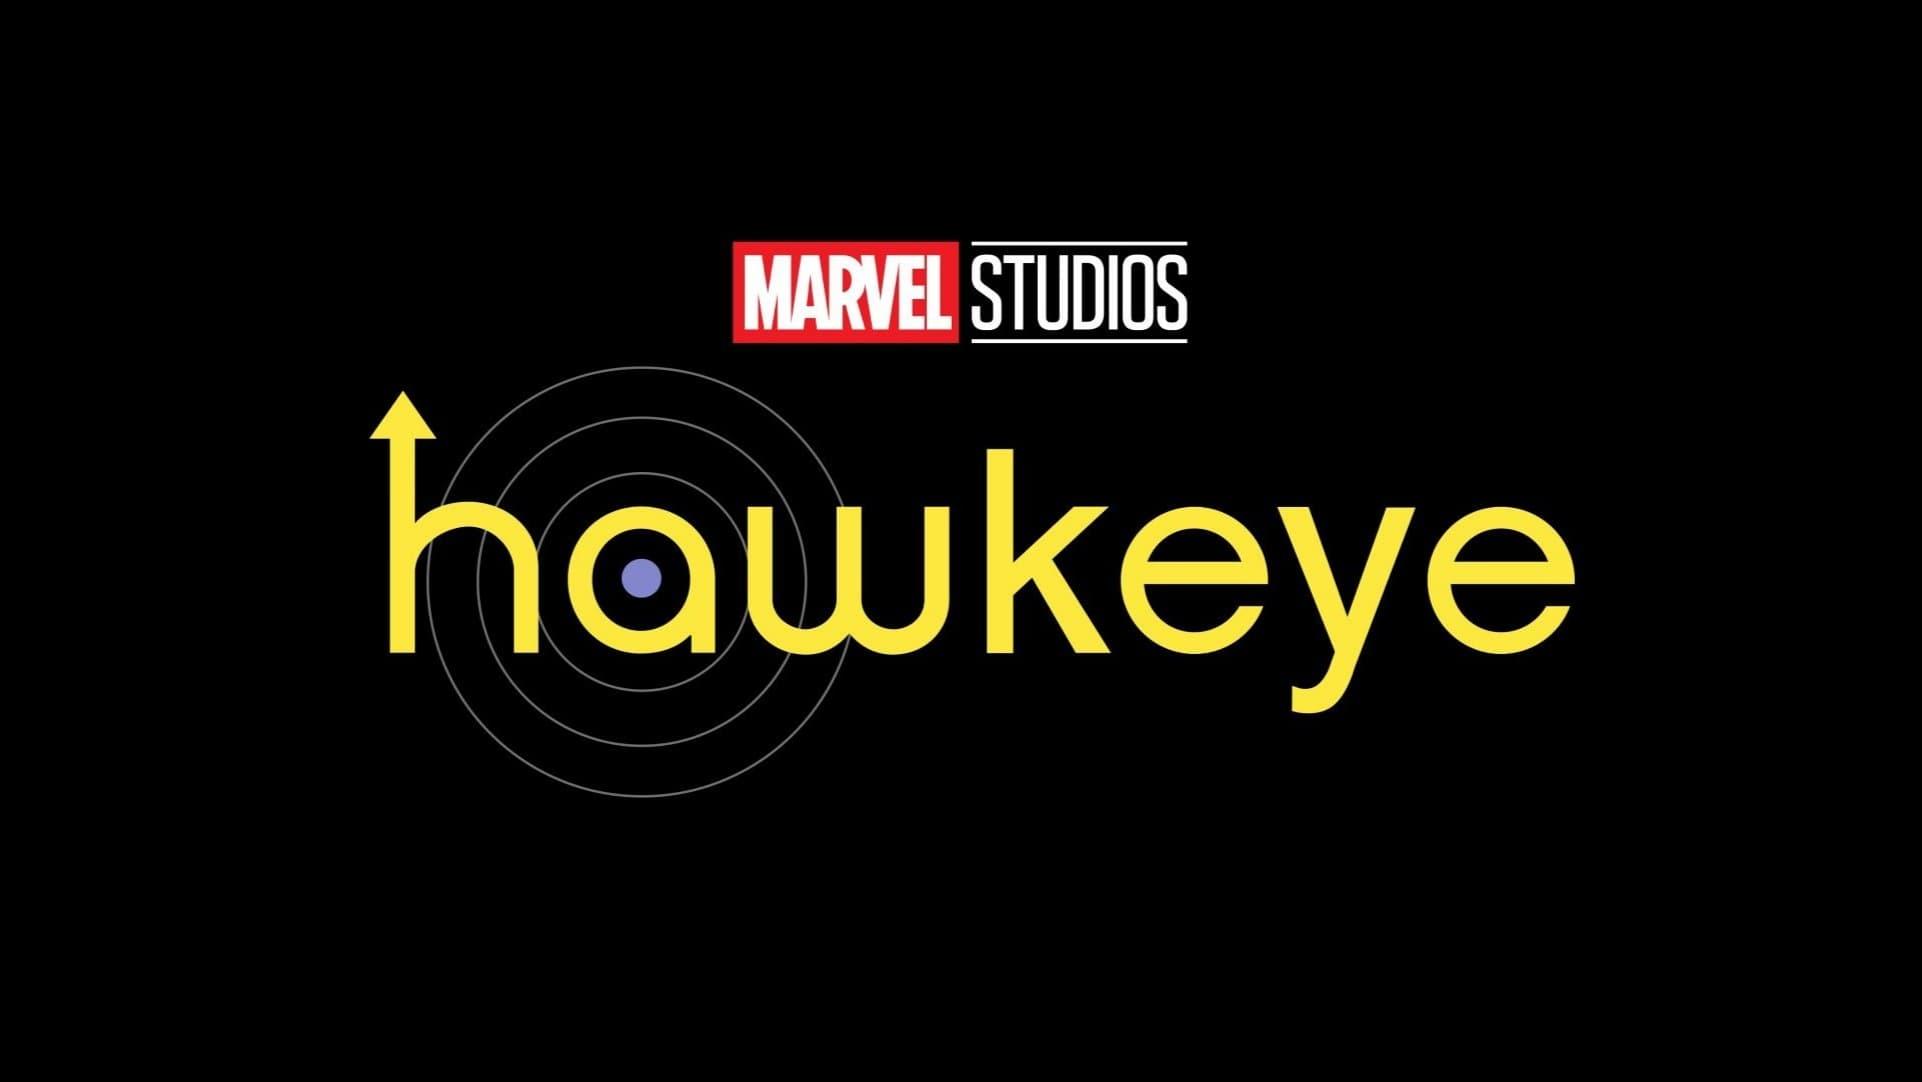 Marvel's Hawkeye to premiere in late November